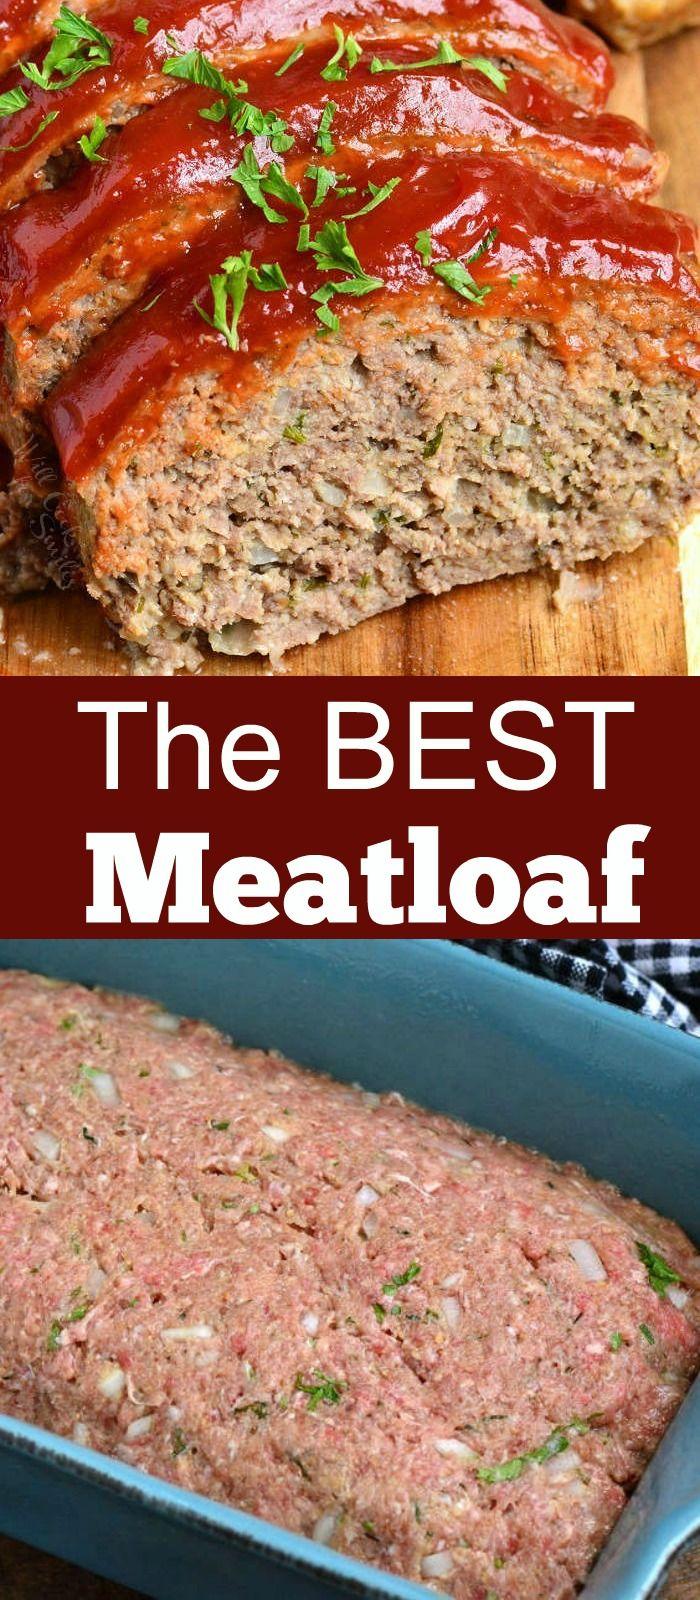 The Very Best Meatloaf Meatloaf Recipes Recipes Best Meatloaf